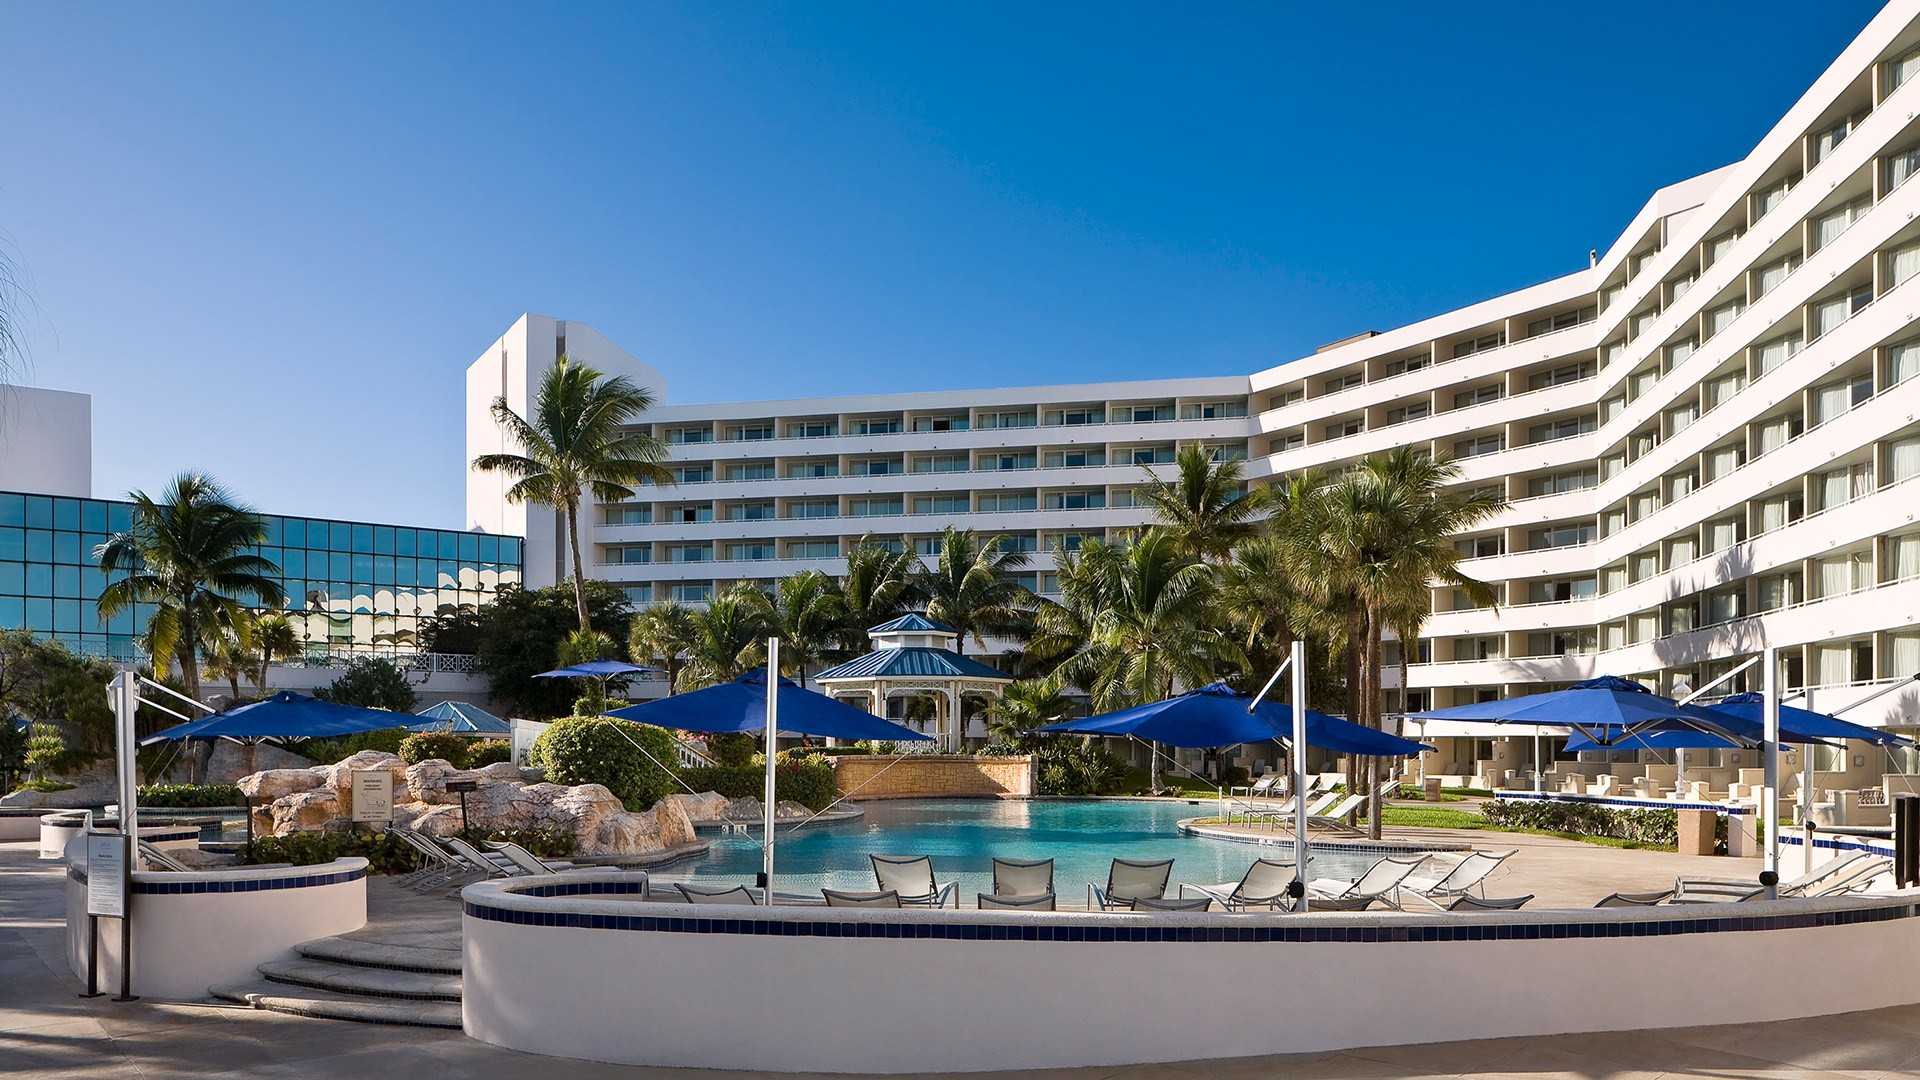 Melia Hotel Nau Bahamas 2018 World S Best Hotels The New Beach